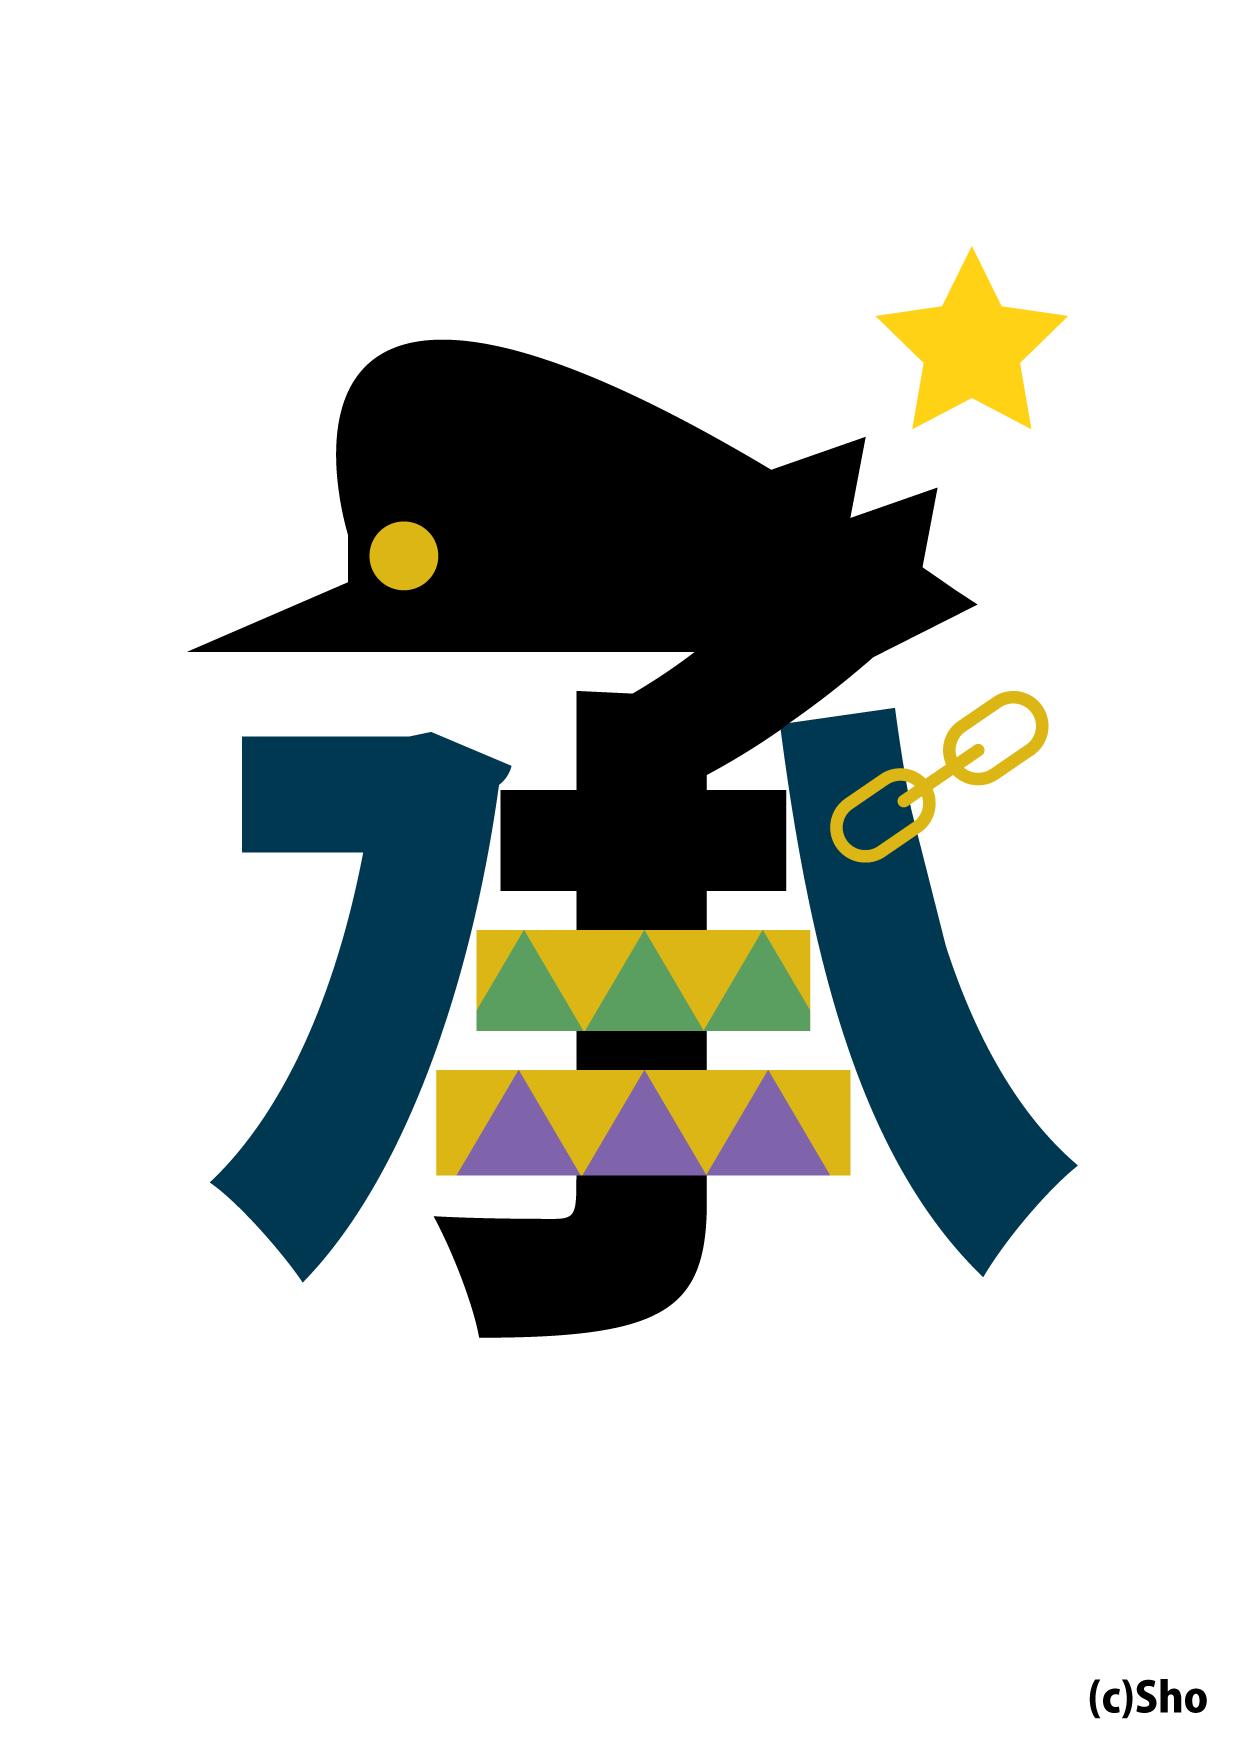 bomber 96ryuji 空条承太郎 sho の作品 pixiv pixitail イラスト 実写 アニメ ジョジョ